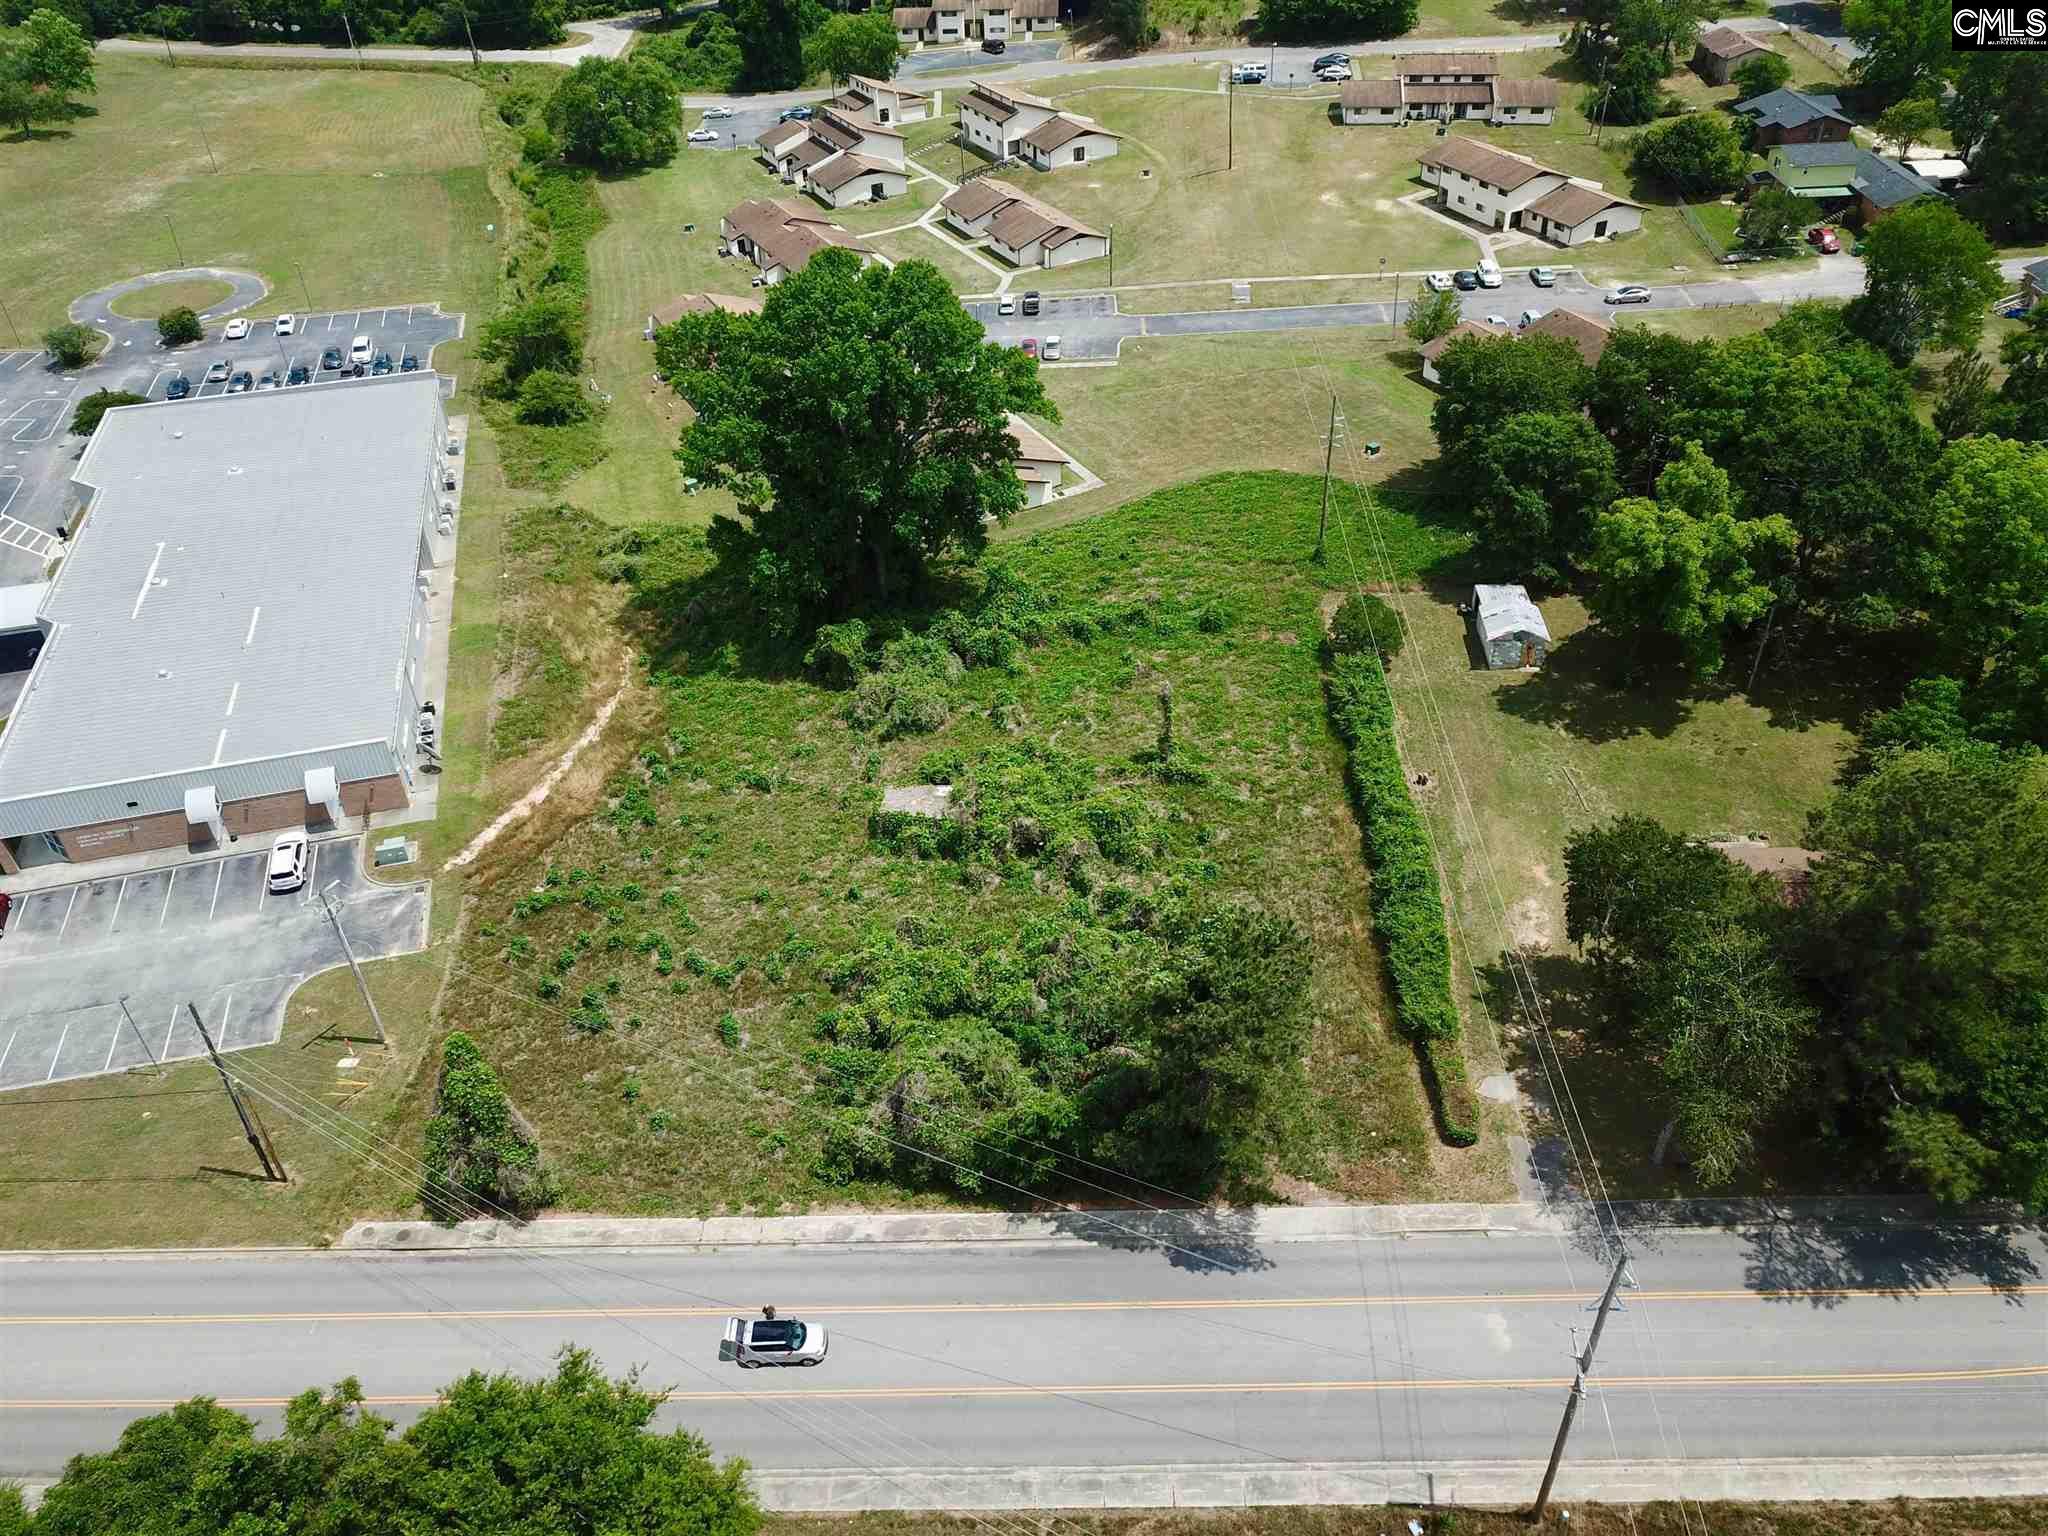 Old Belleville Rd St. Matthews, SC 29135